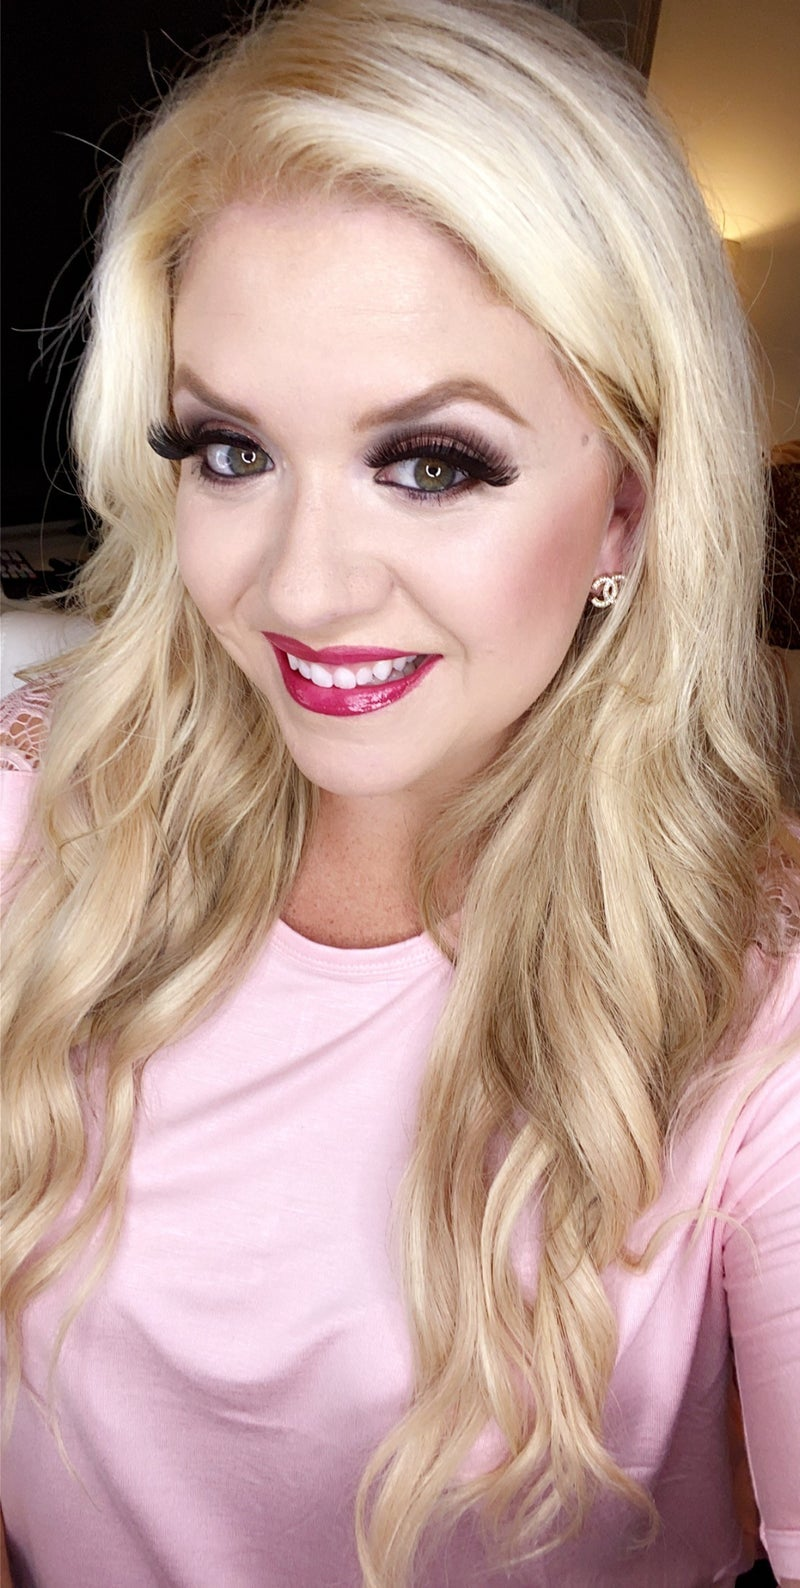 Beauty by Brittany Matte Lipstick - Raspberry *Final Sale*